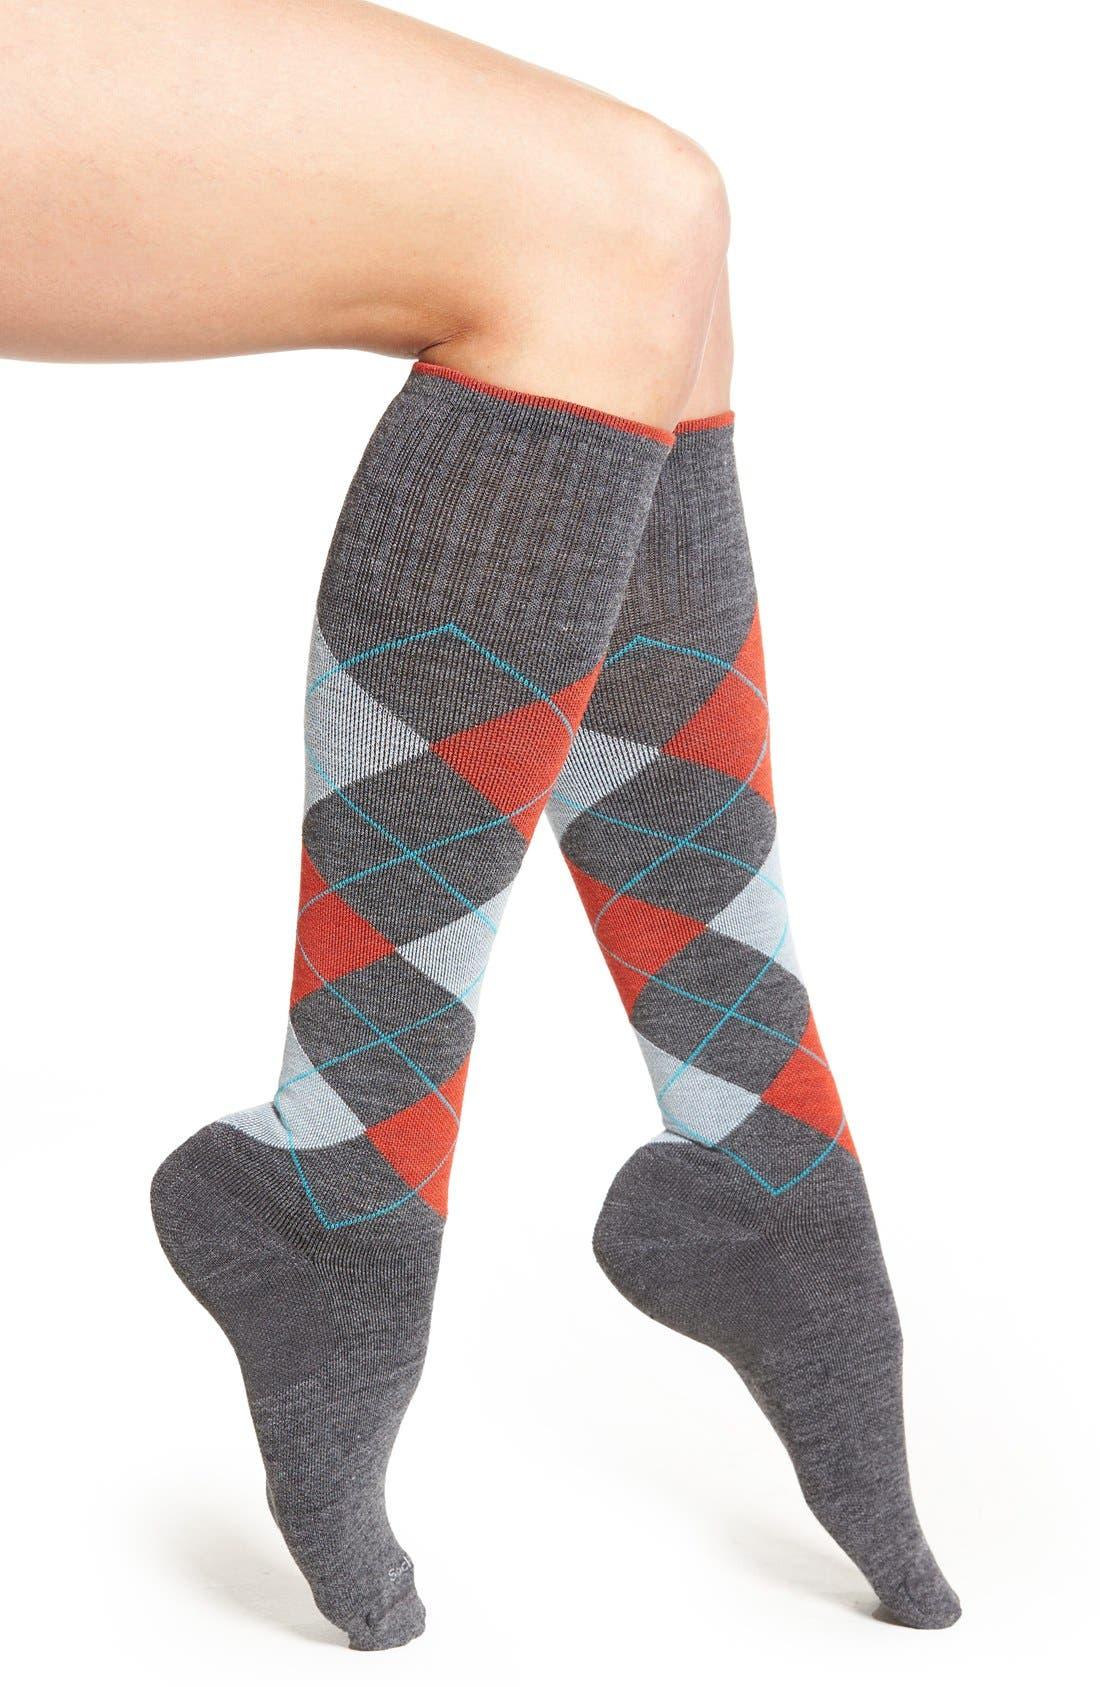 Argyle Compression Knee Socks,                         Main,                         color, Charcoal